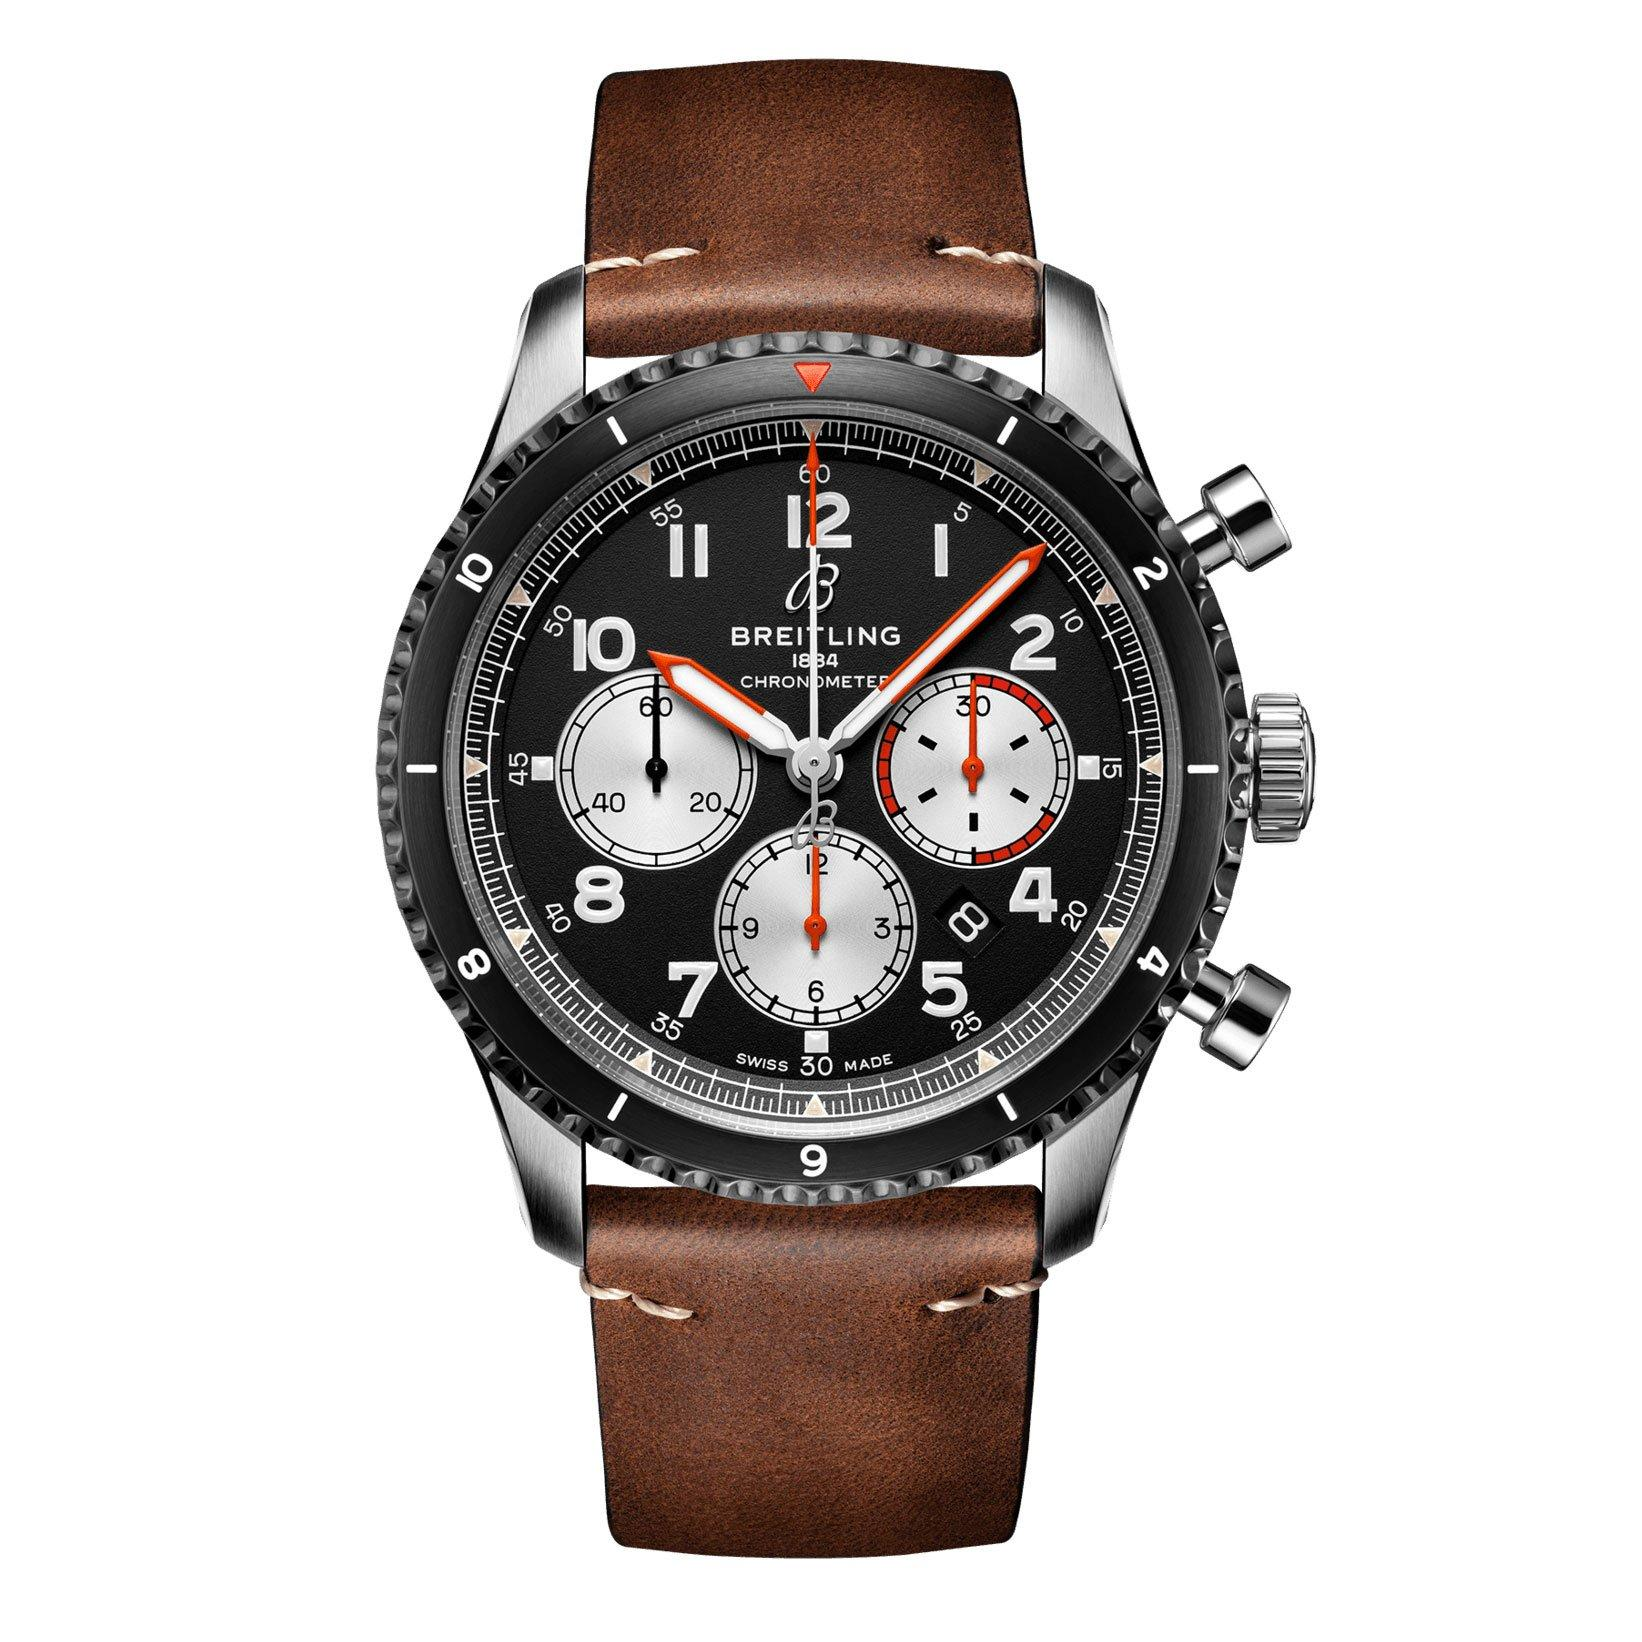 Breitling Aviator 8 B01 Chronograph 43 Mosquito Automatic Men's Watch